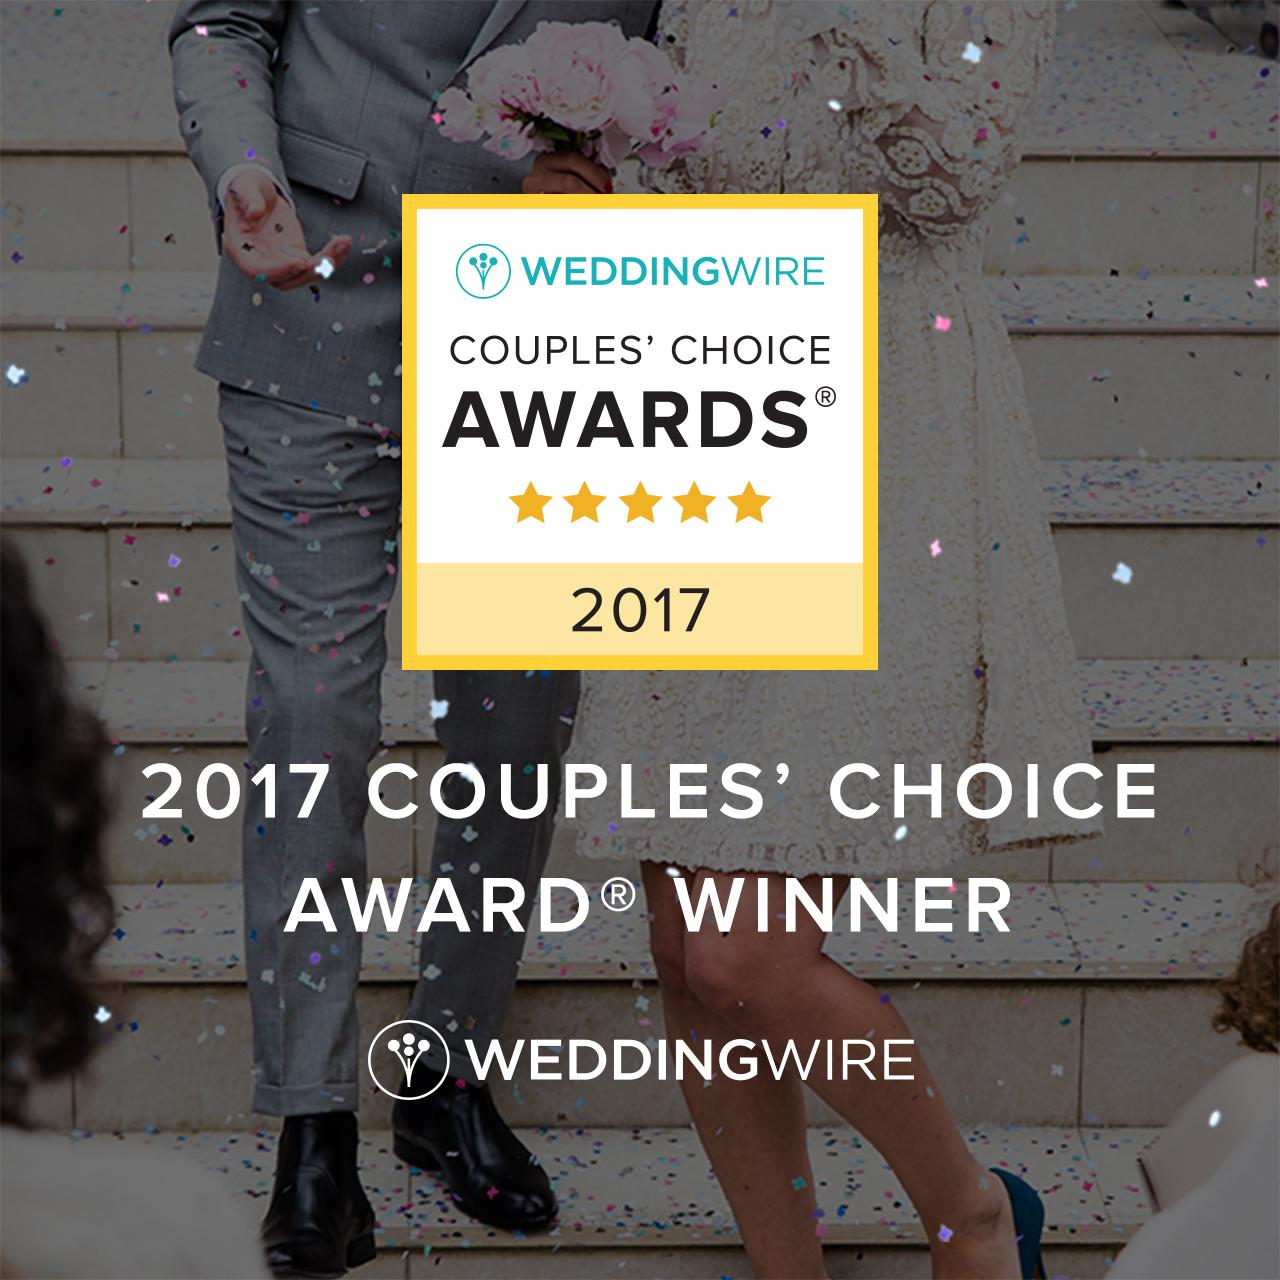 weddingwire-couples-choice-awards-2017.jpg